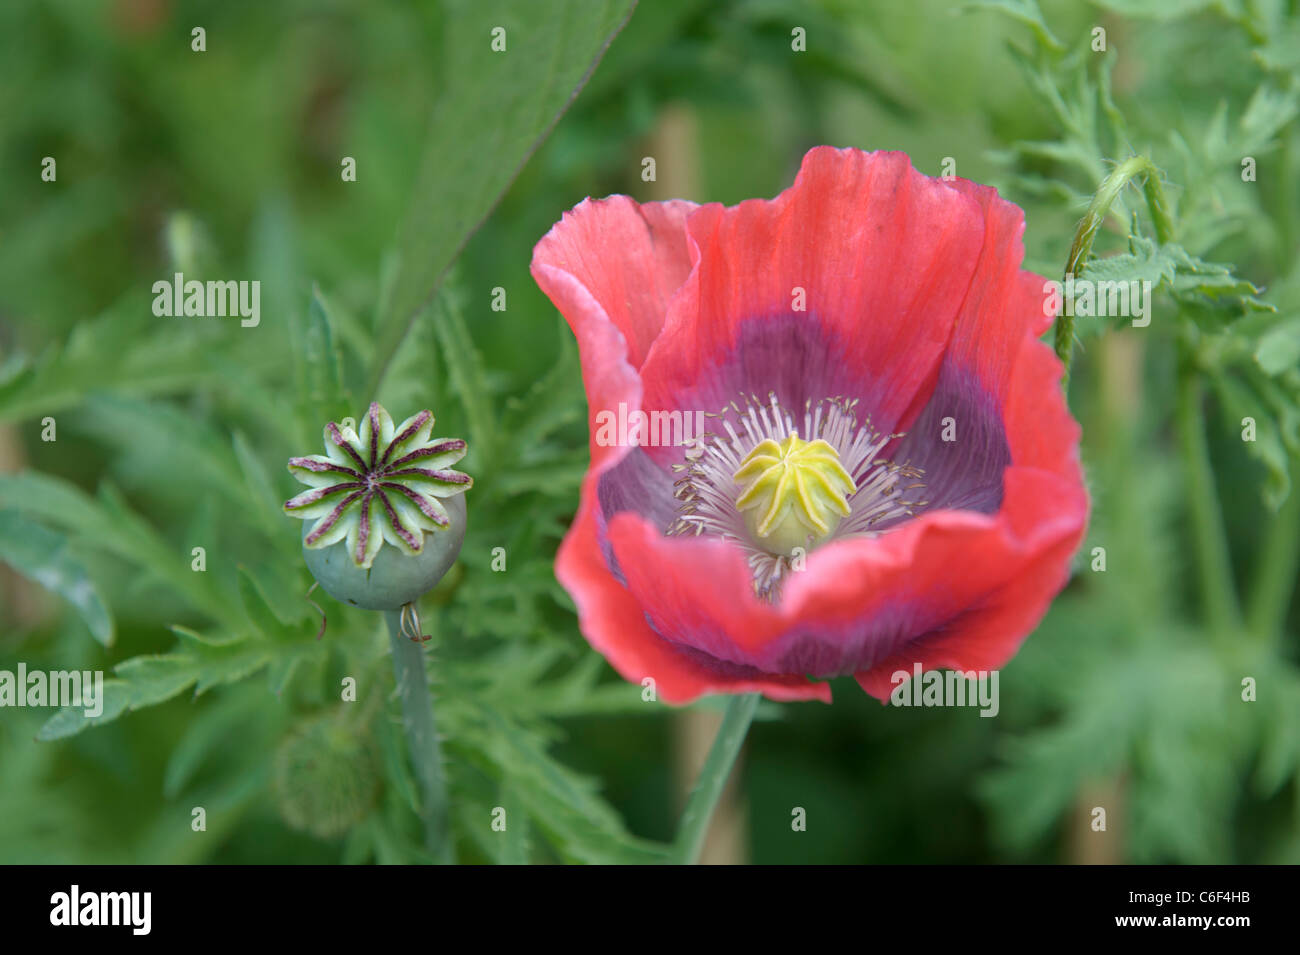 Red Poppy Flower Seed Pod Stock Photos Red Poppy Flower Seed Pod